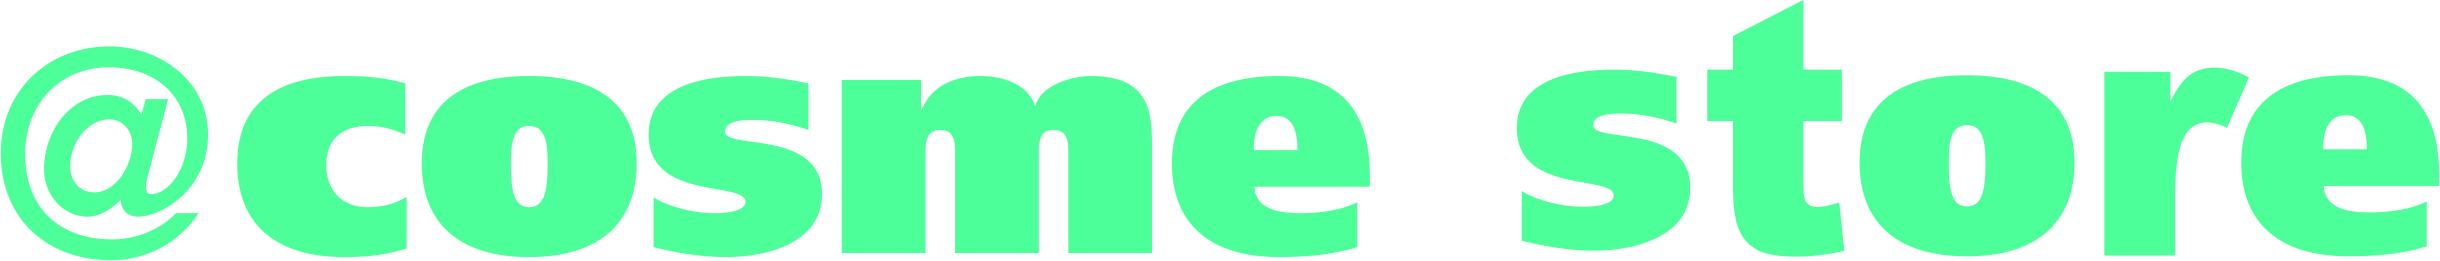 2013_storeロゴ